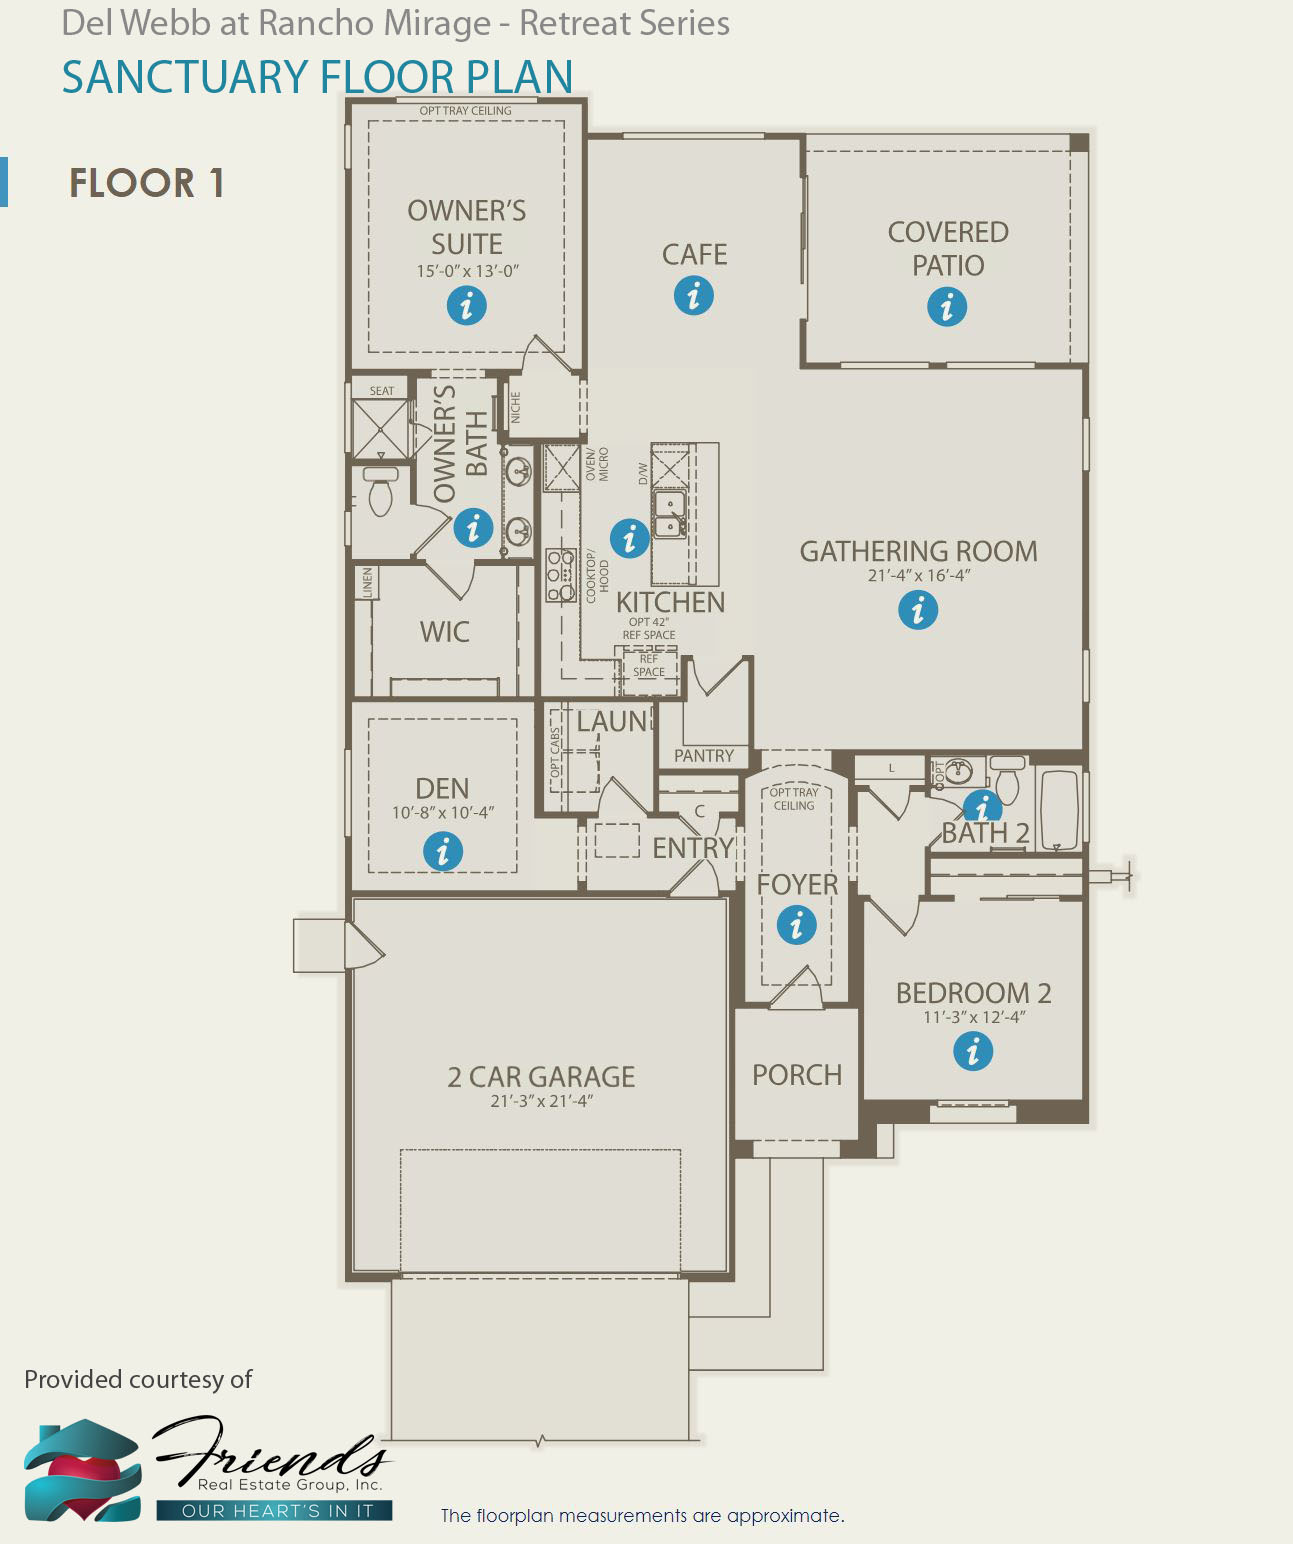 Retreat Series ~ Sanctuary Floor Plan